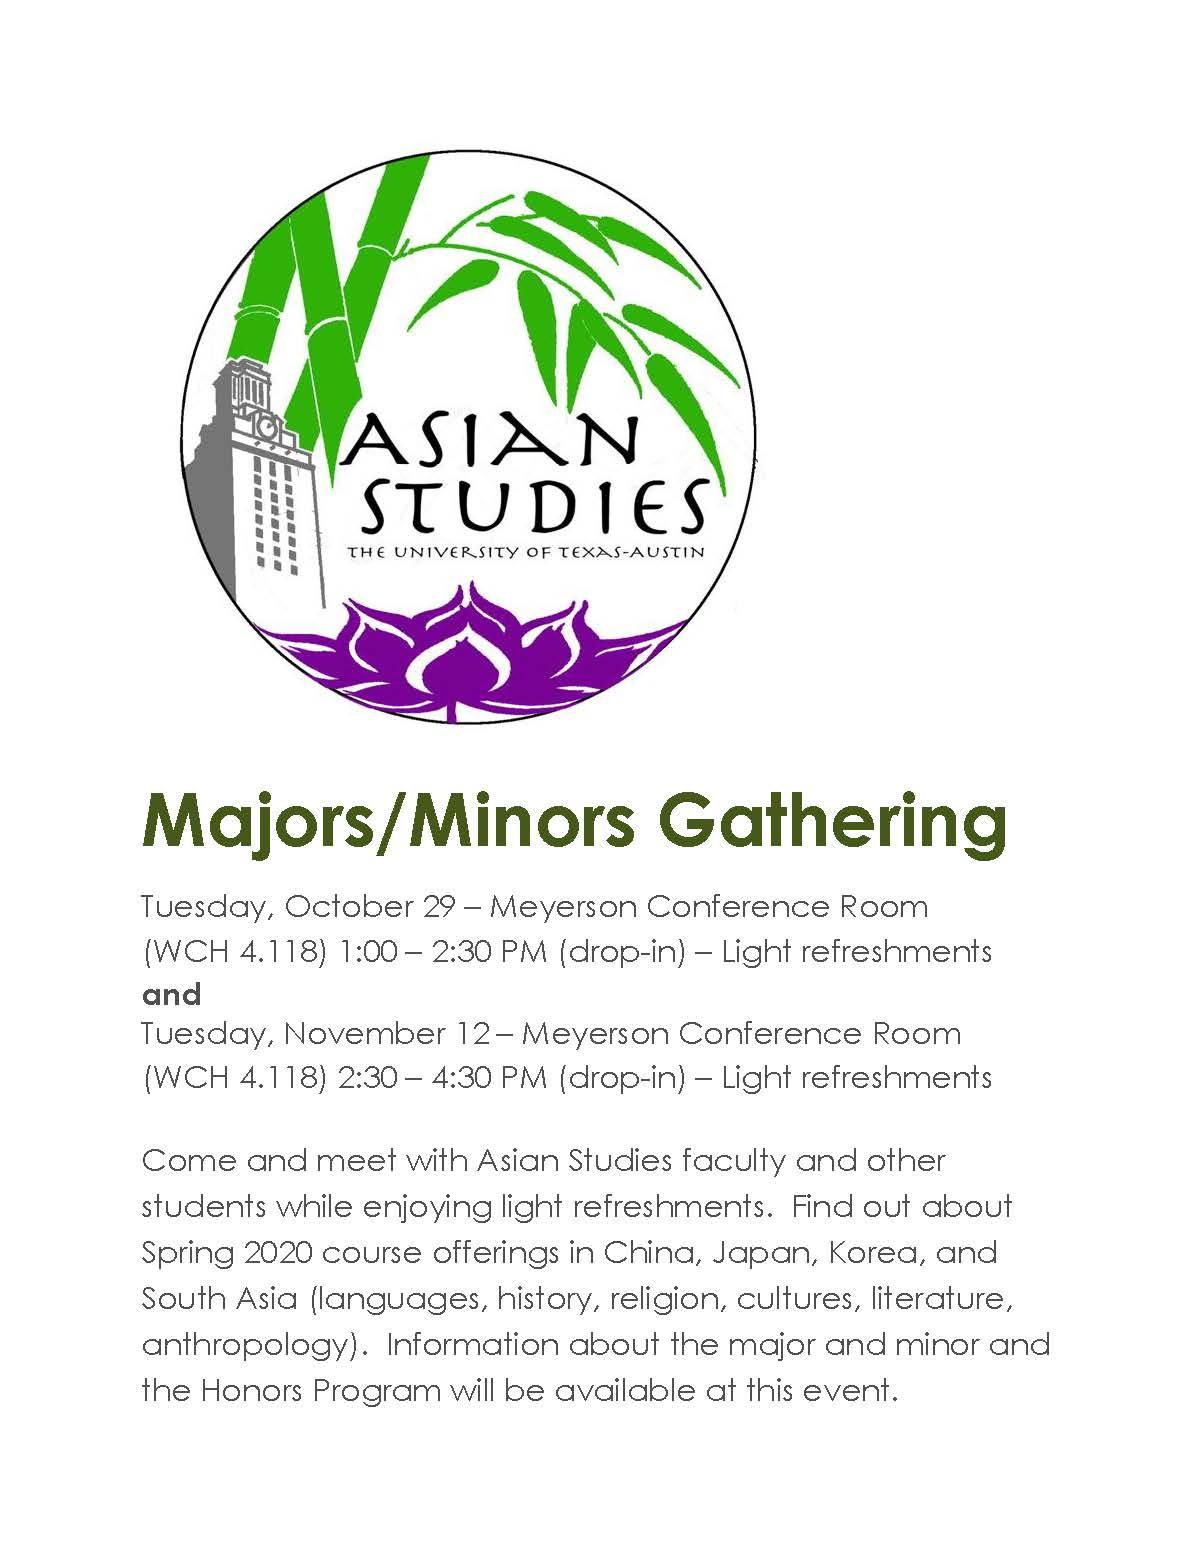 Majors/Minors Gathering (drop-in)